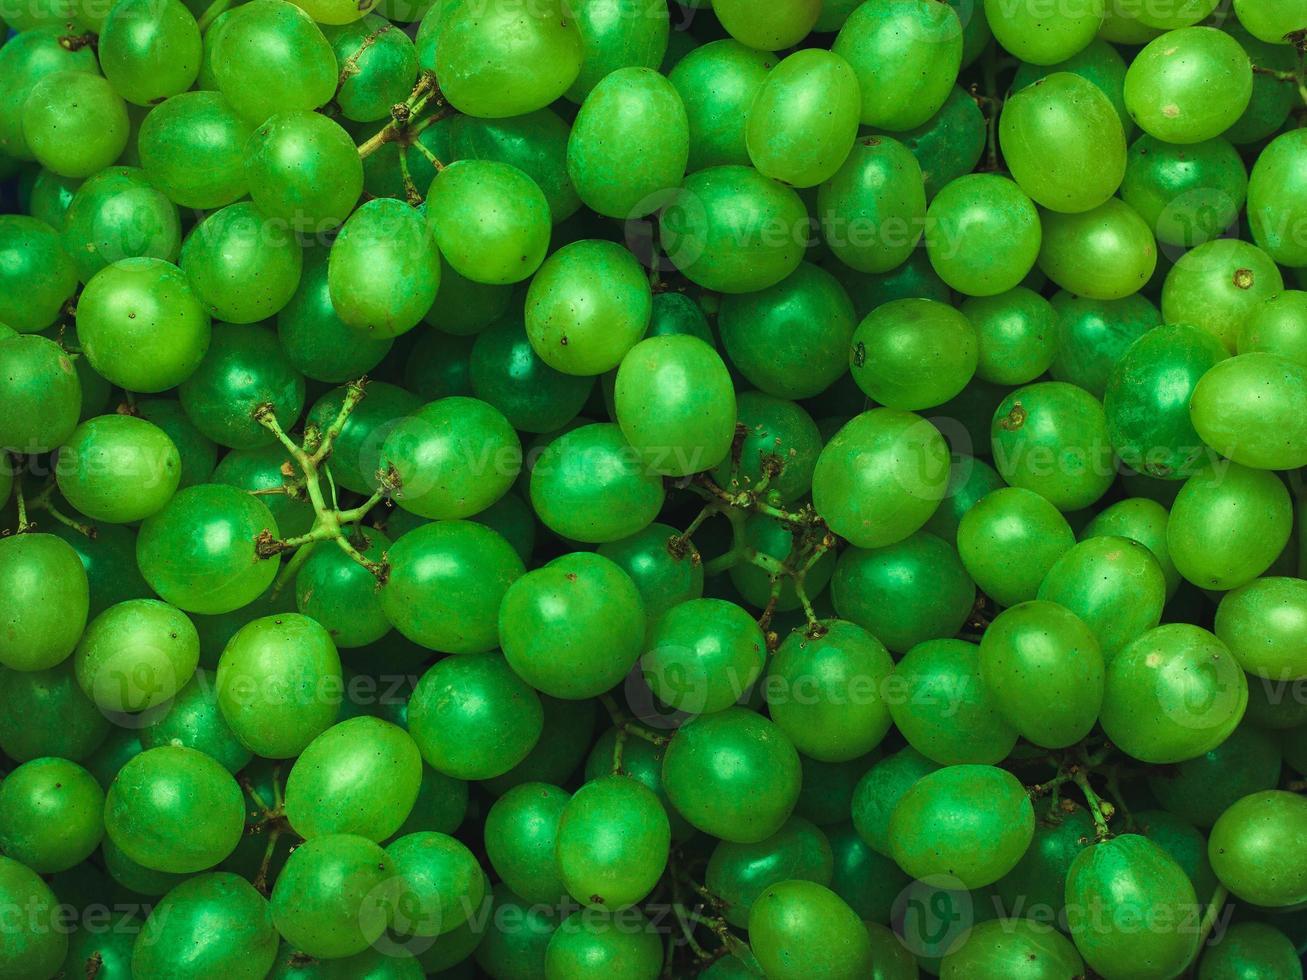 gros raisins verts. photo